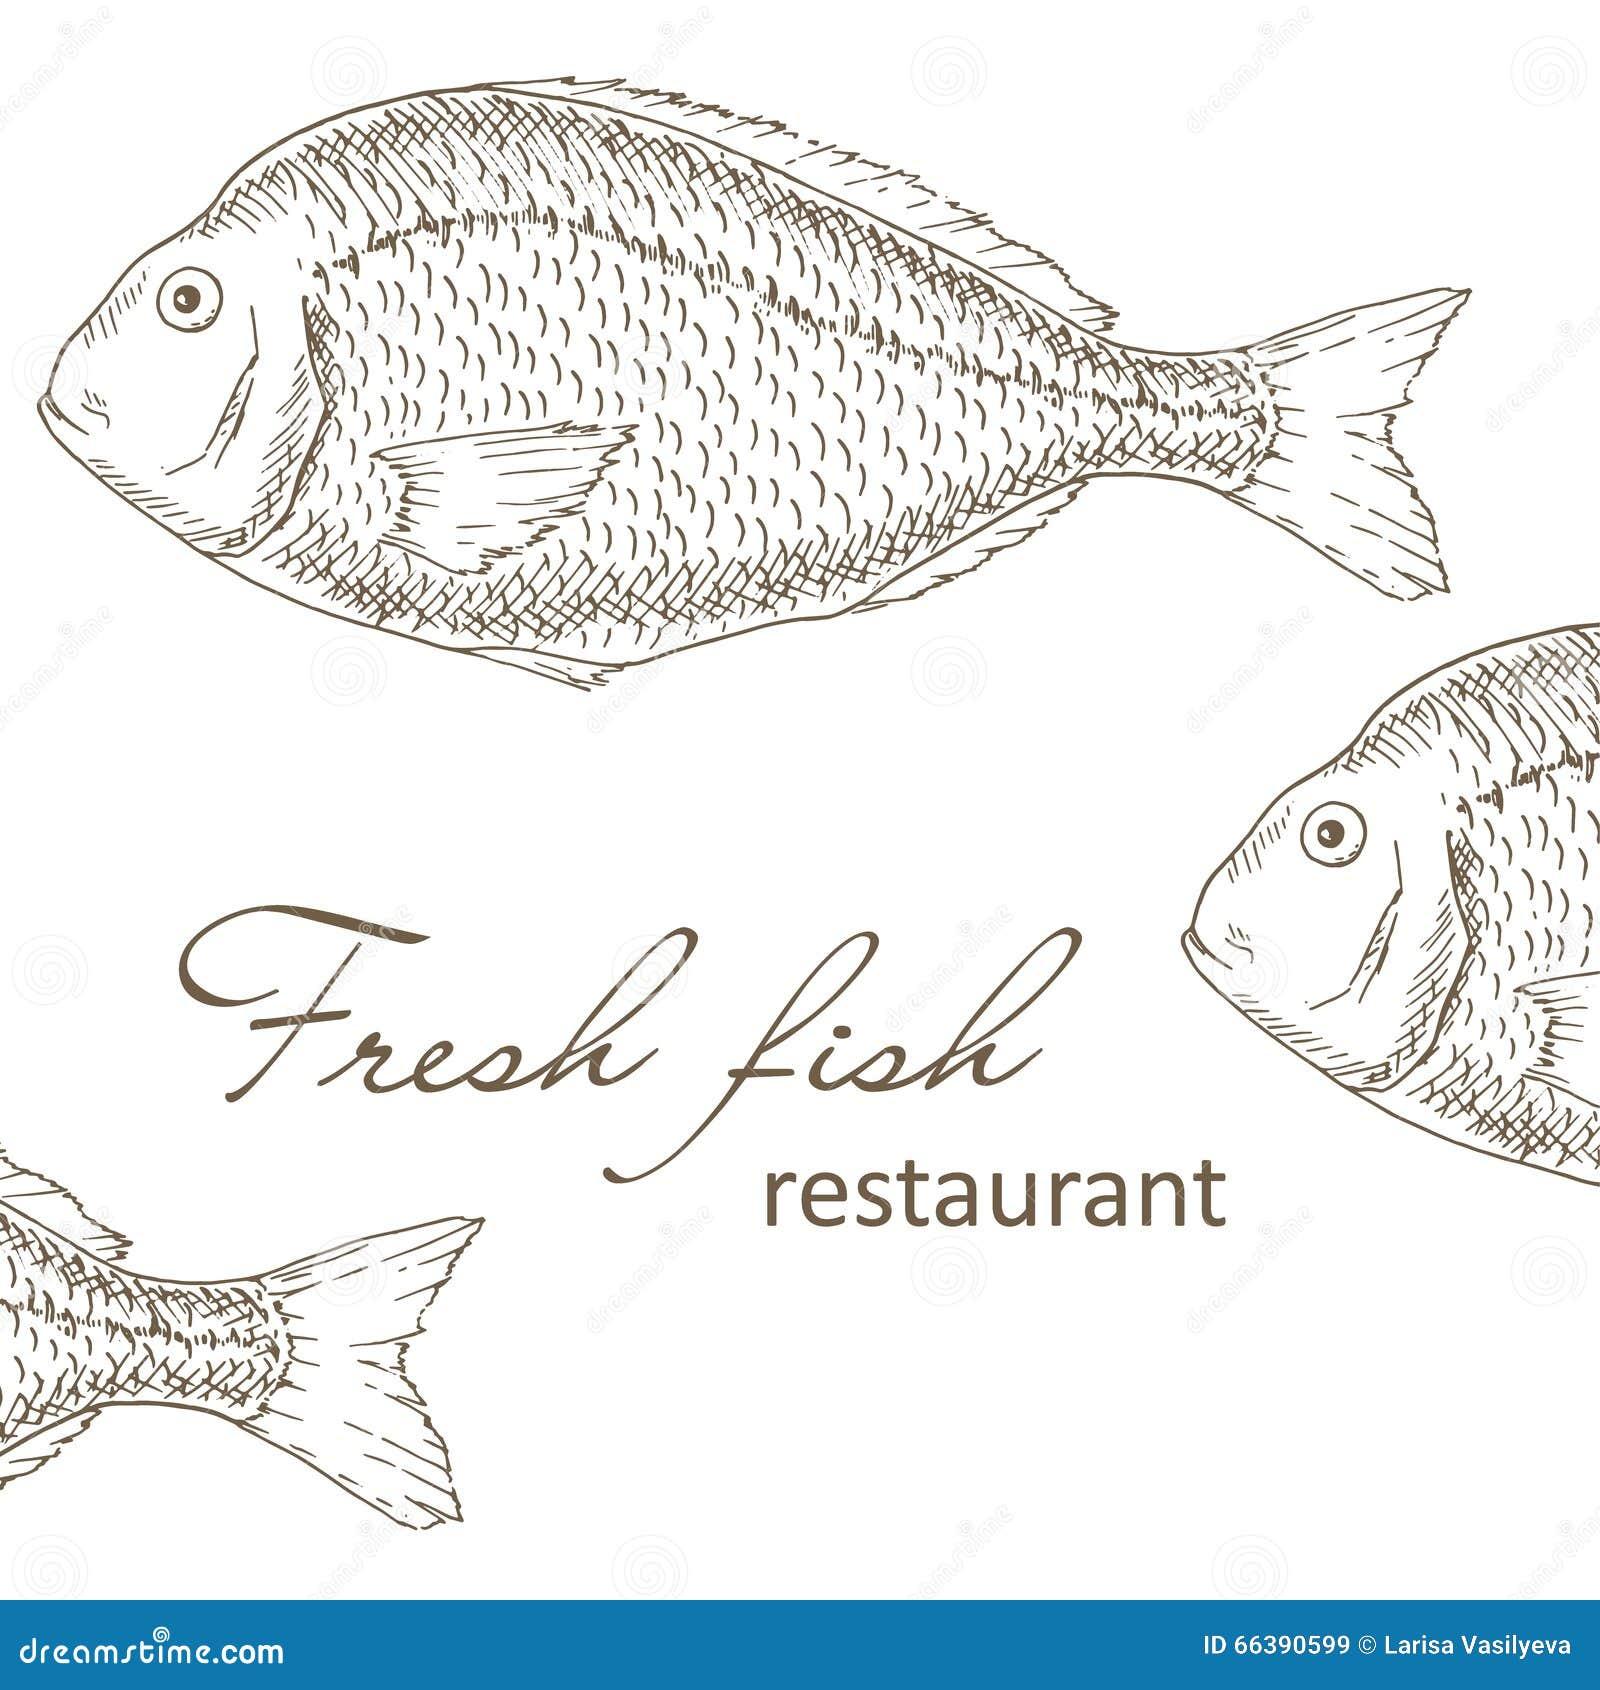 fish restaurant cover design stock vector